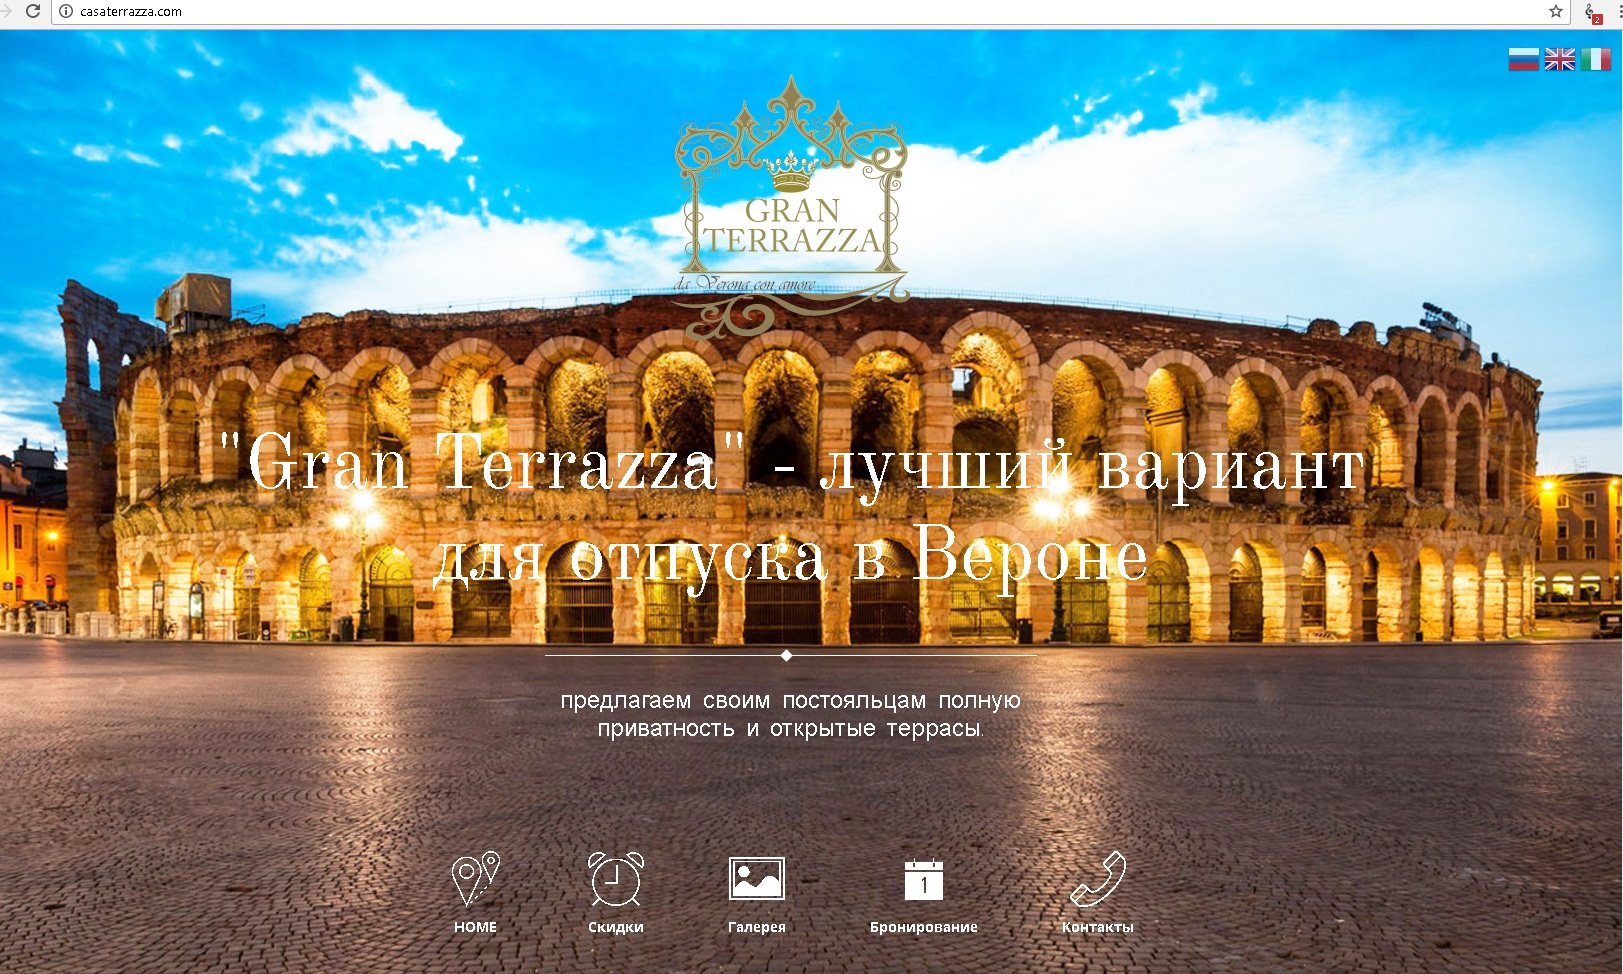 """Gran Terrazza"" - лучший вариант для отпуска в Вероне"